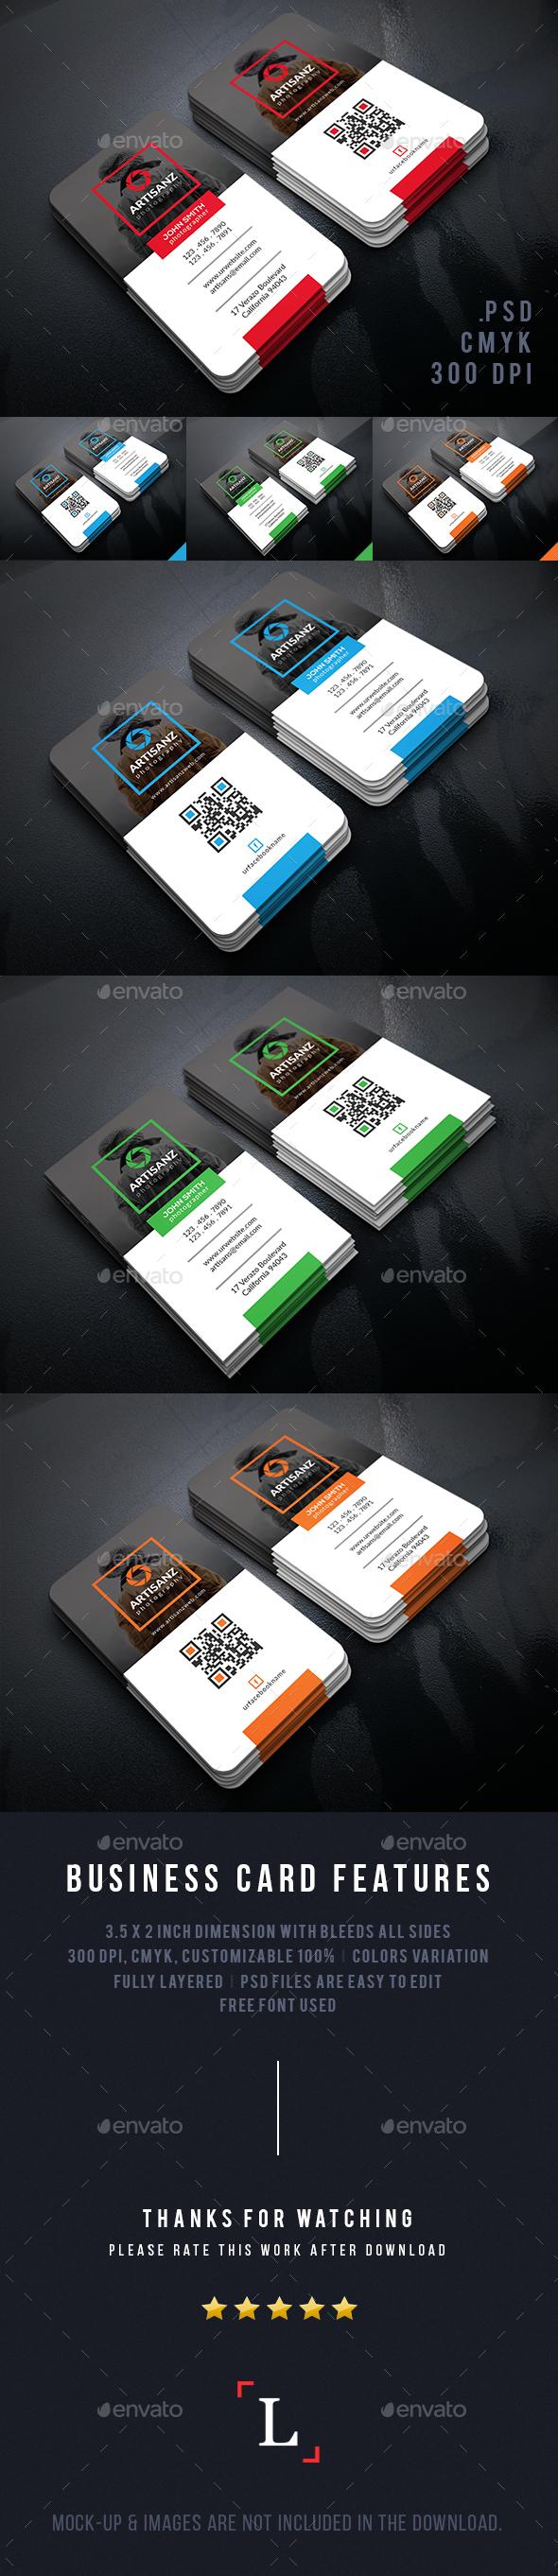 Creative Photographer Business Cards - Business Cards Print Templates